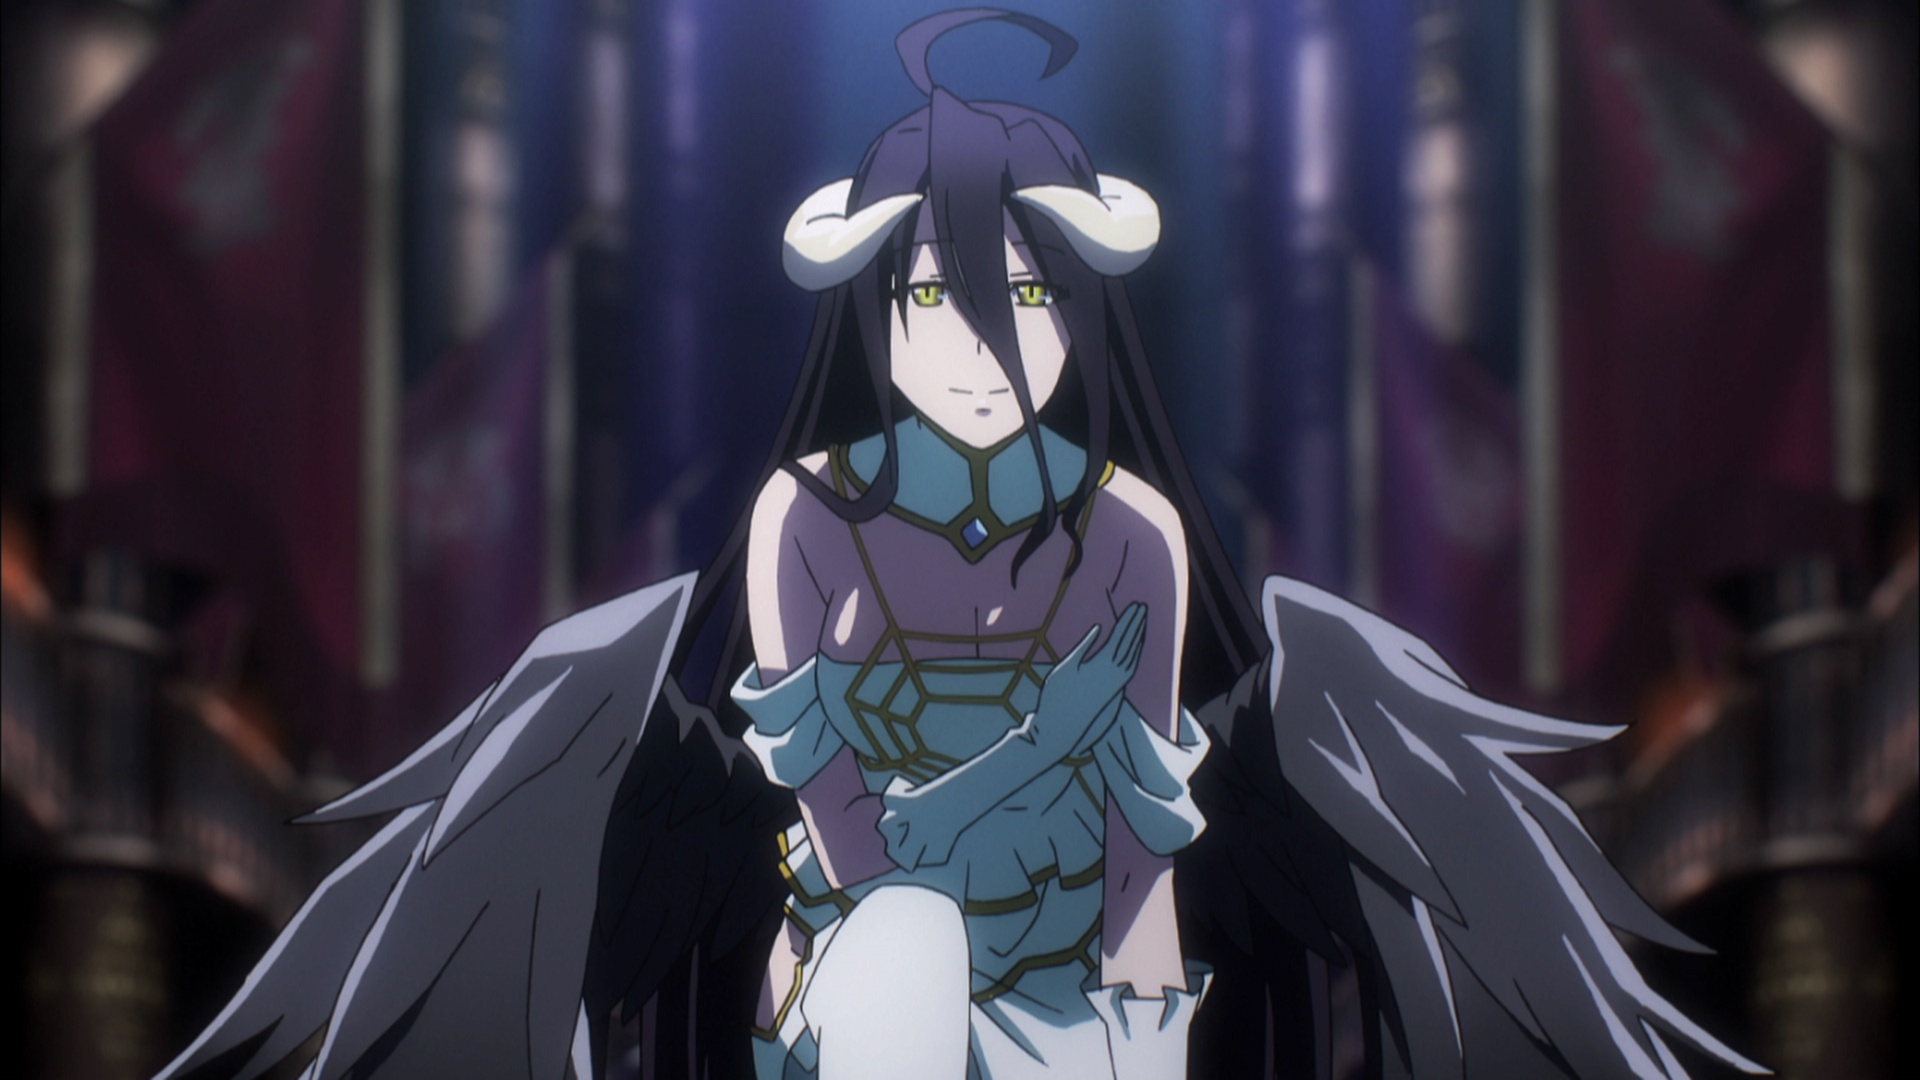 Watch Overlord Season 3 Episode 33 Sub & Dub | Anime